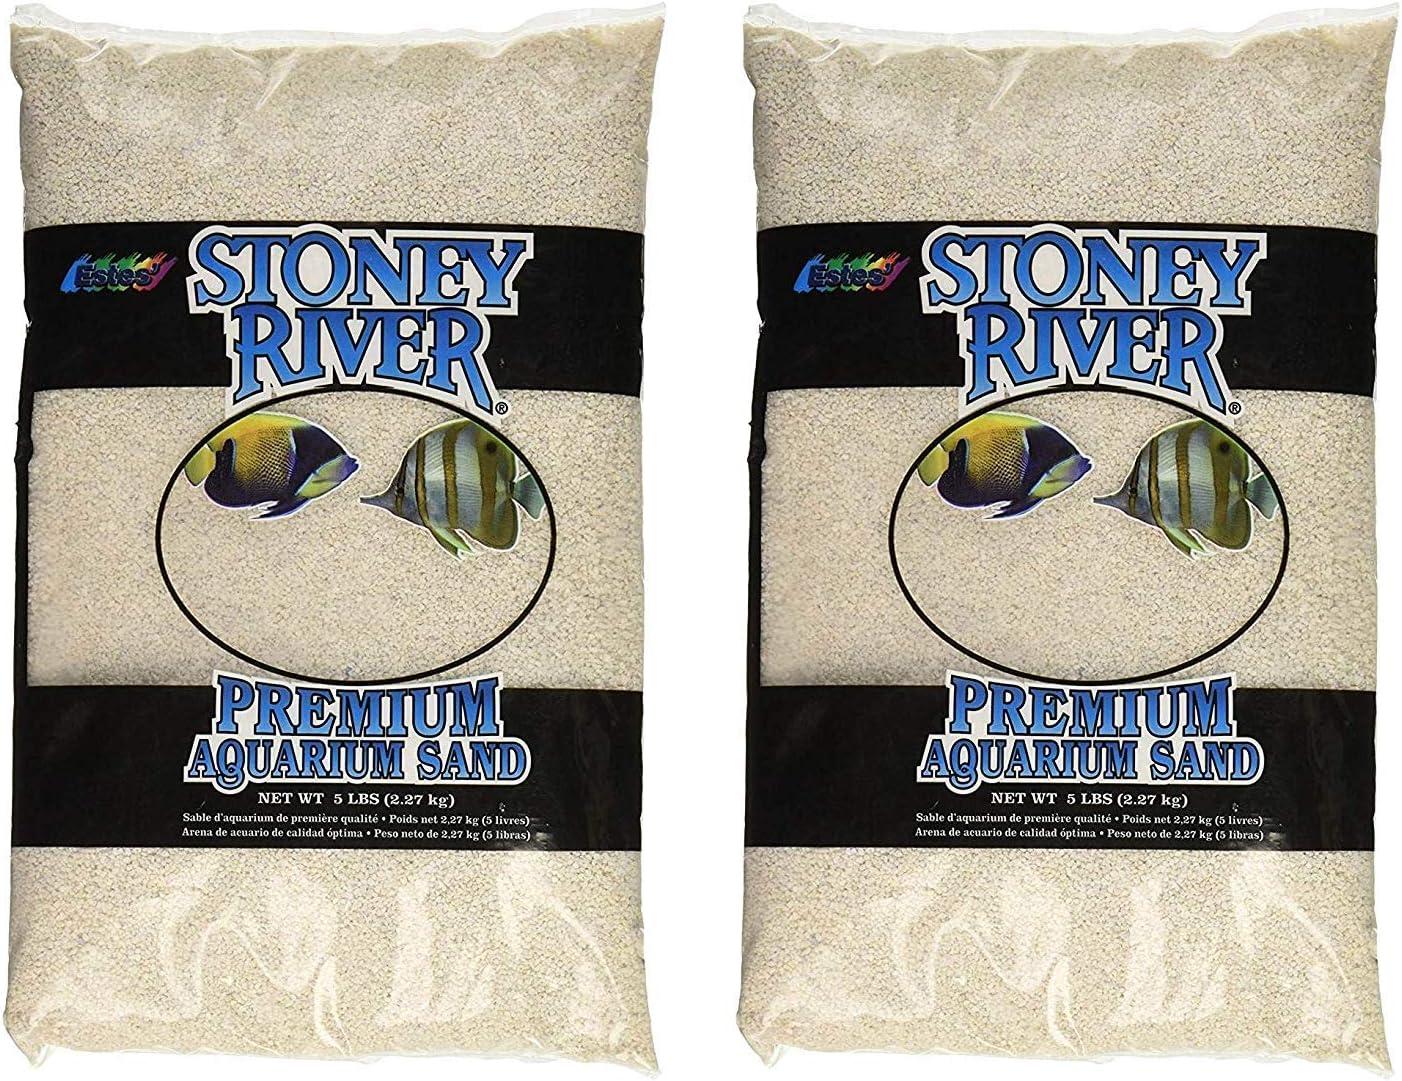 Stoney River White Aquatic Super-cheap Sand Freshwater trend rank and Marine Aquariums